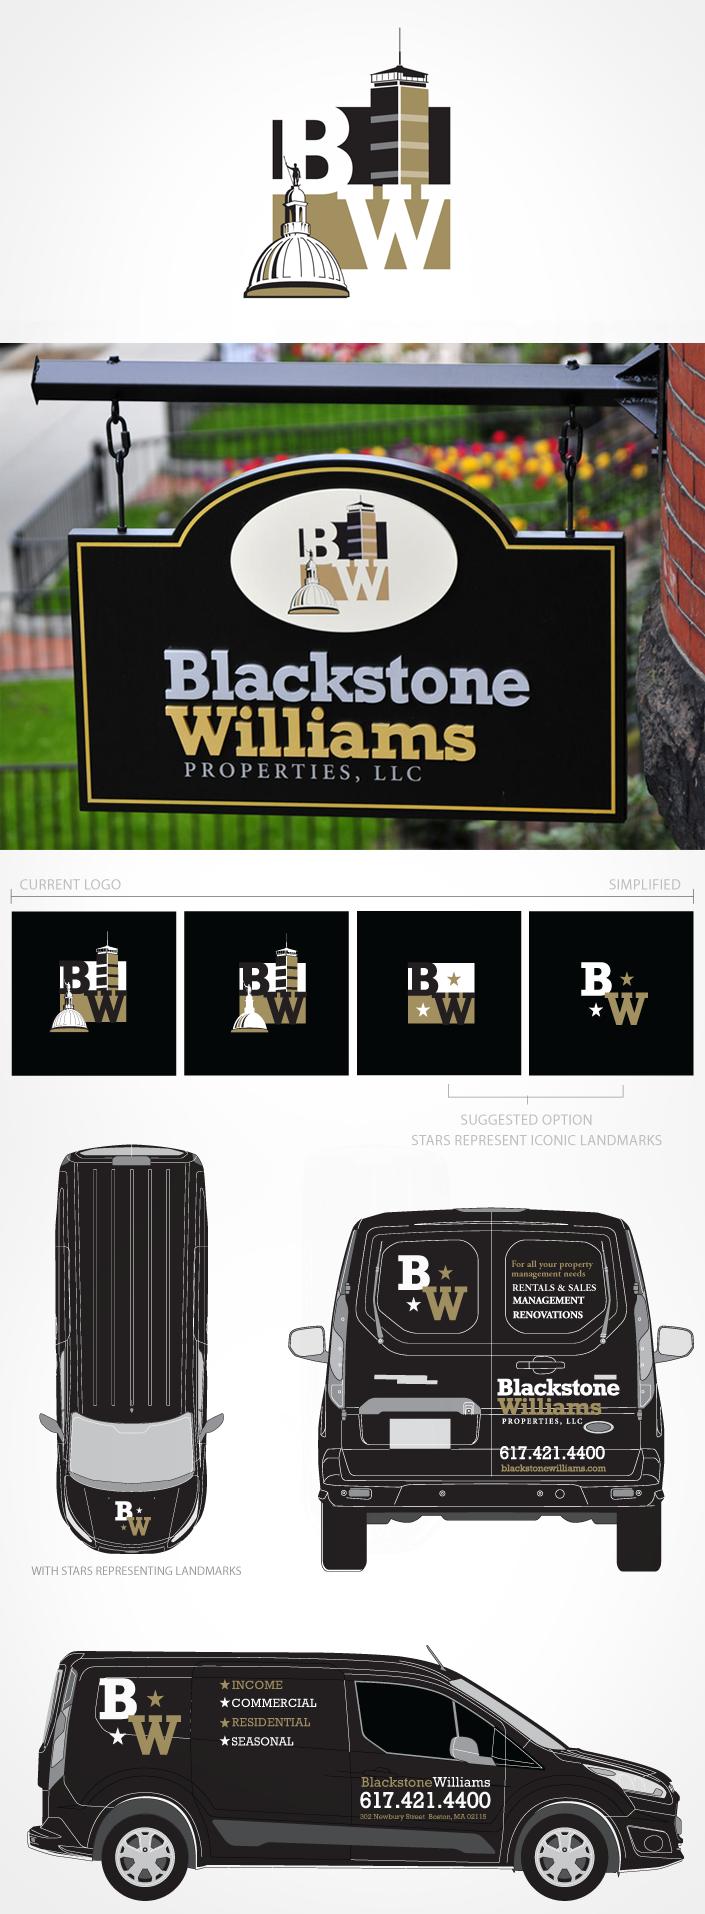 Blackstone Williams